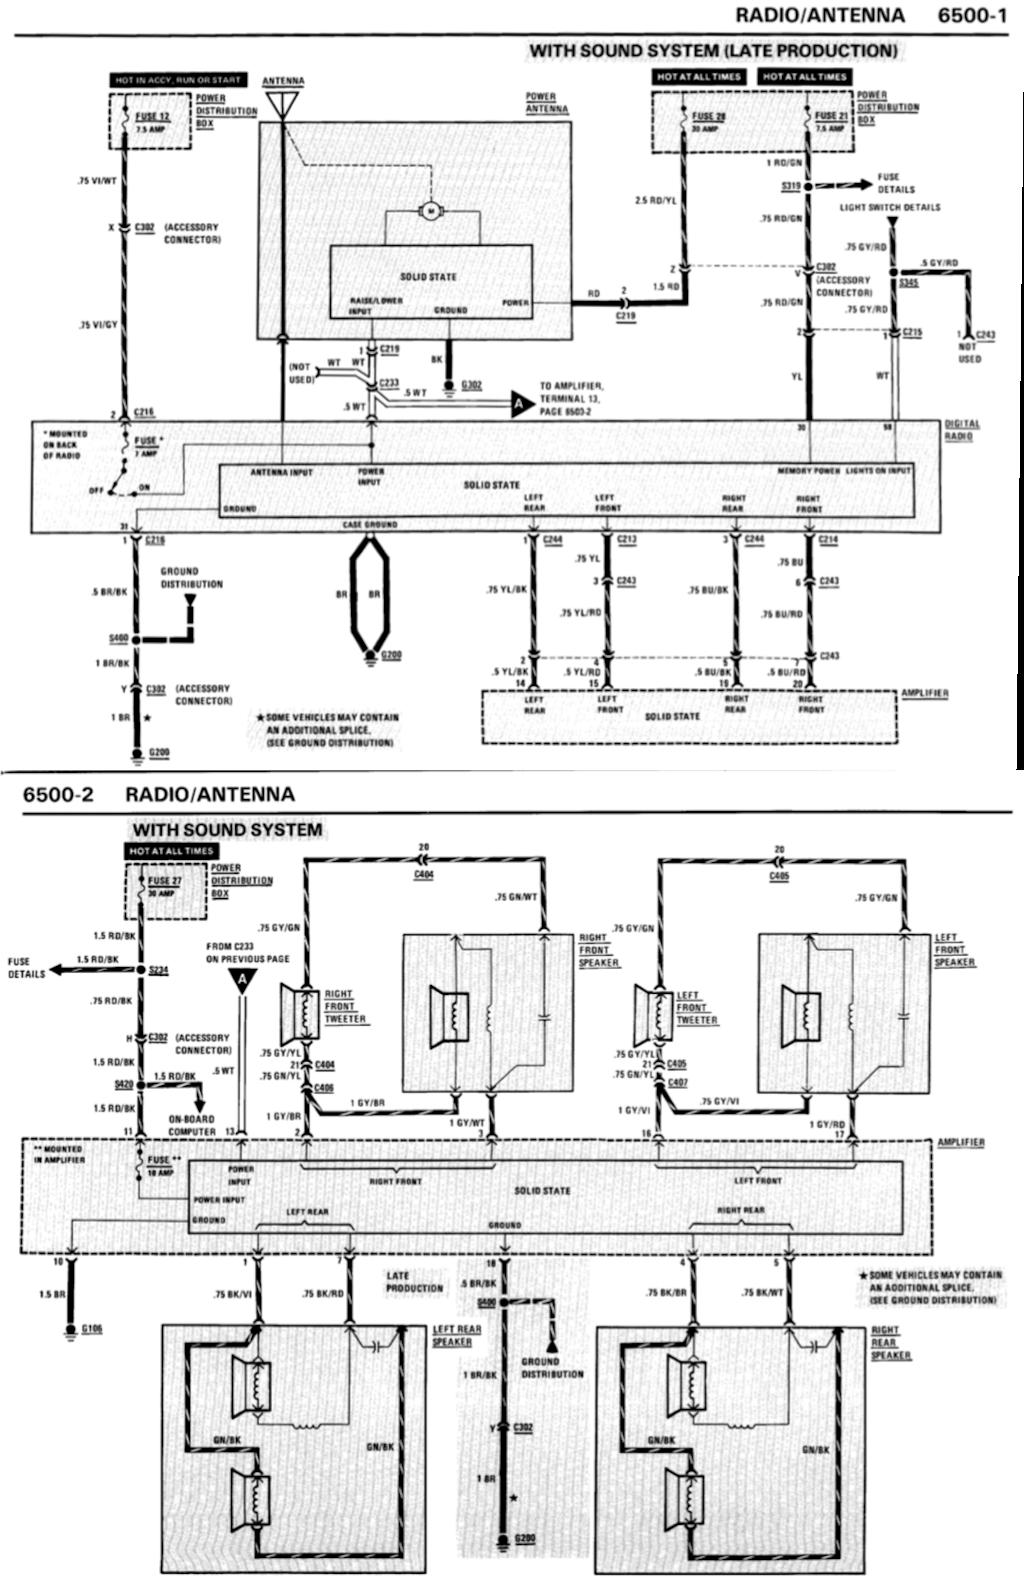 [ZHKZ_3066]  Understanding E30 speaker and amp wiring - R3VLimited Forums | 1989 Bmw Wiring Diagram |  | R3Vlimited.com